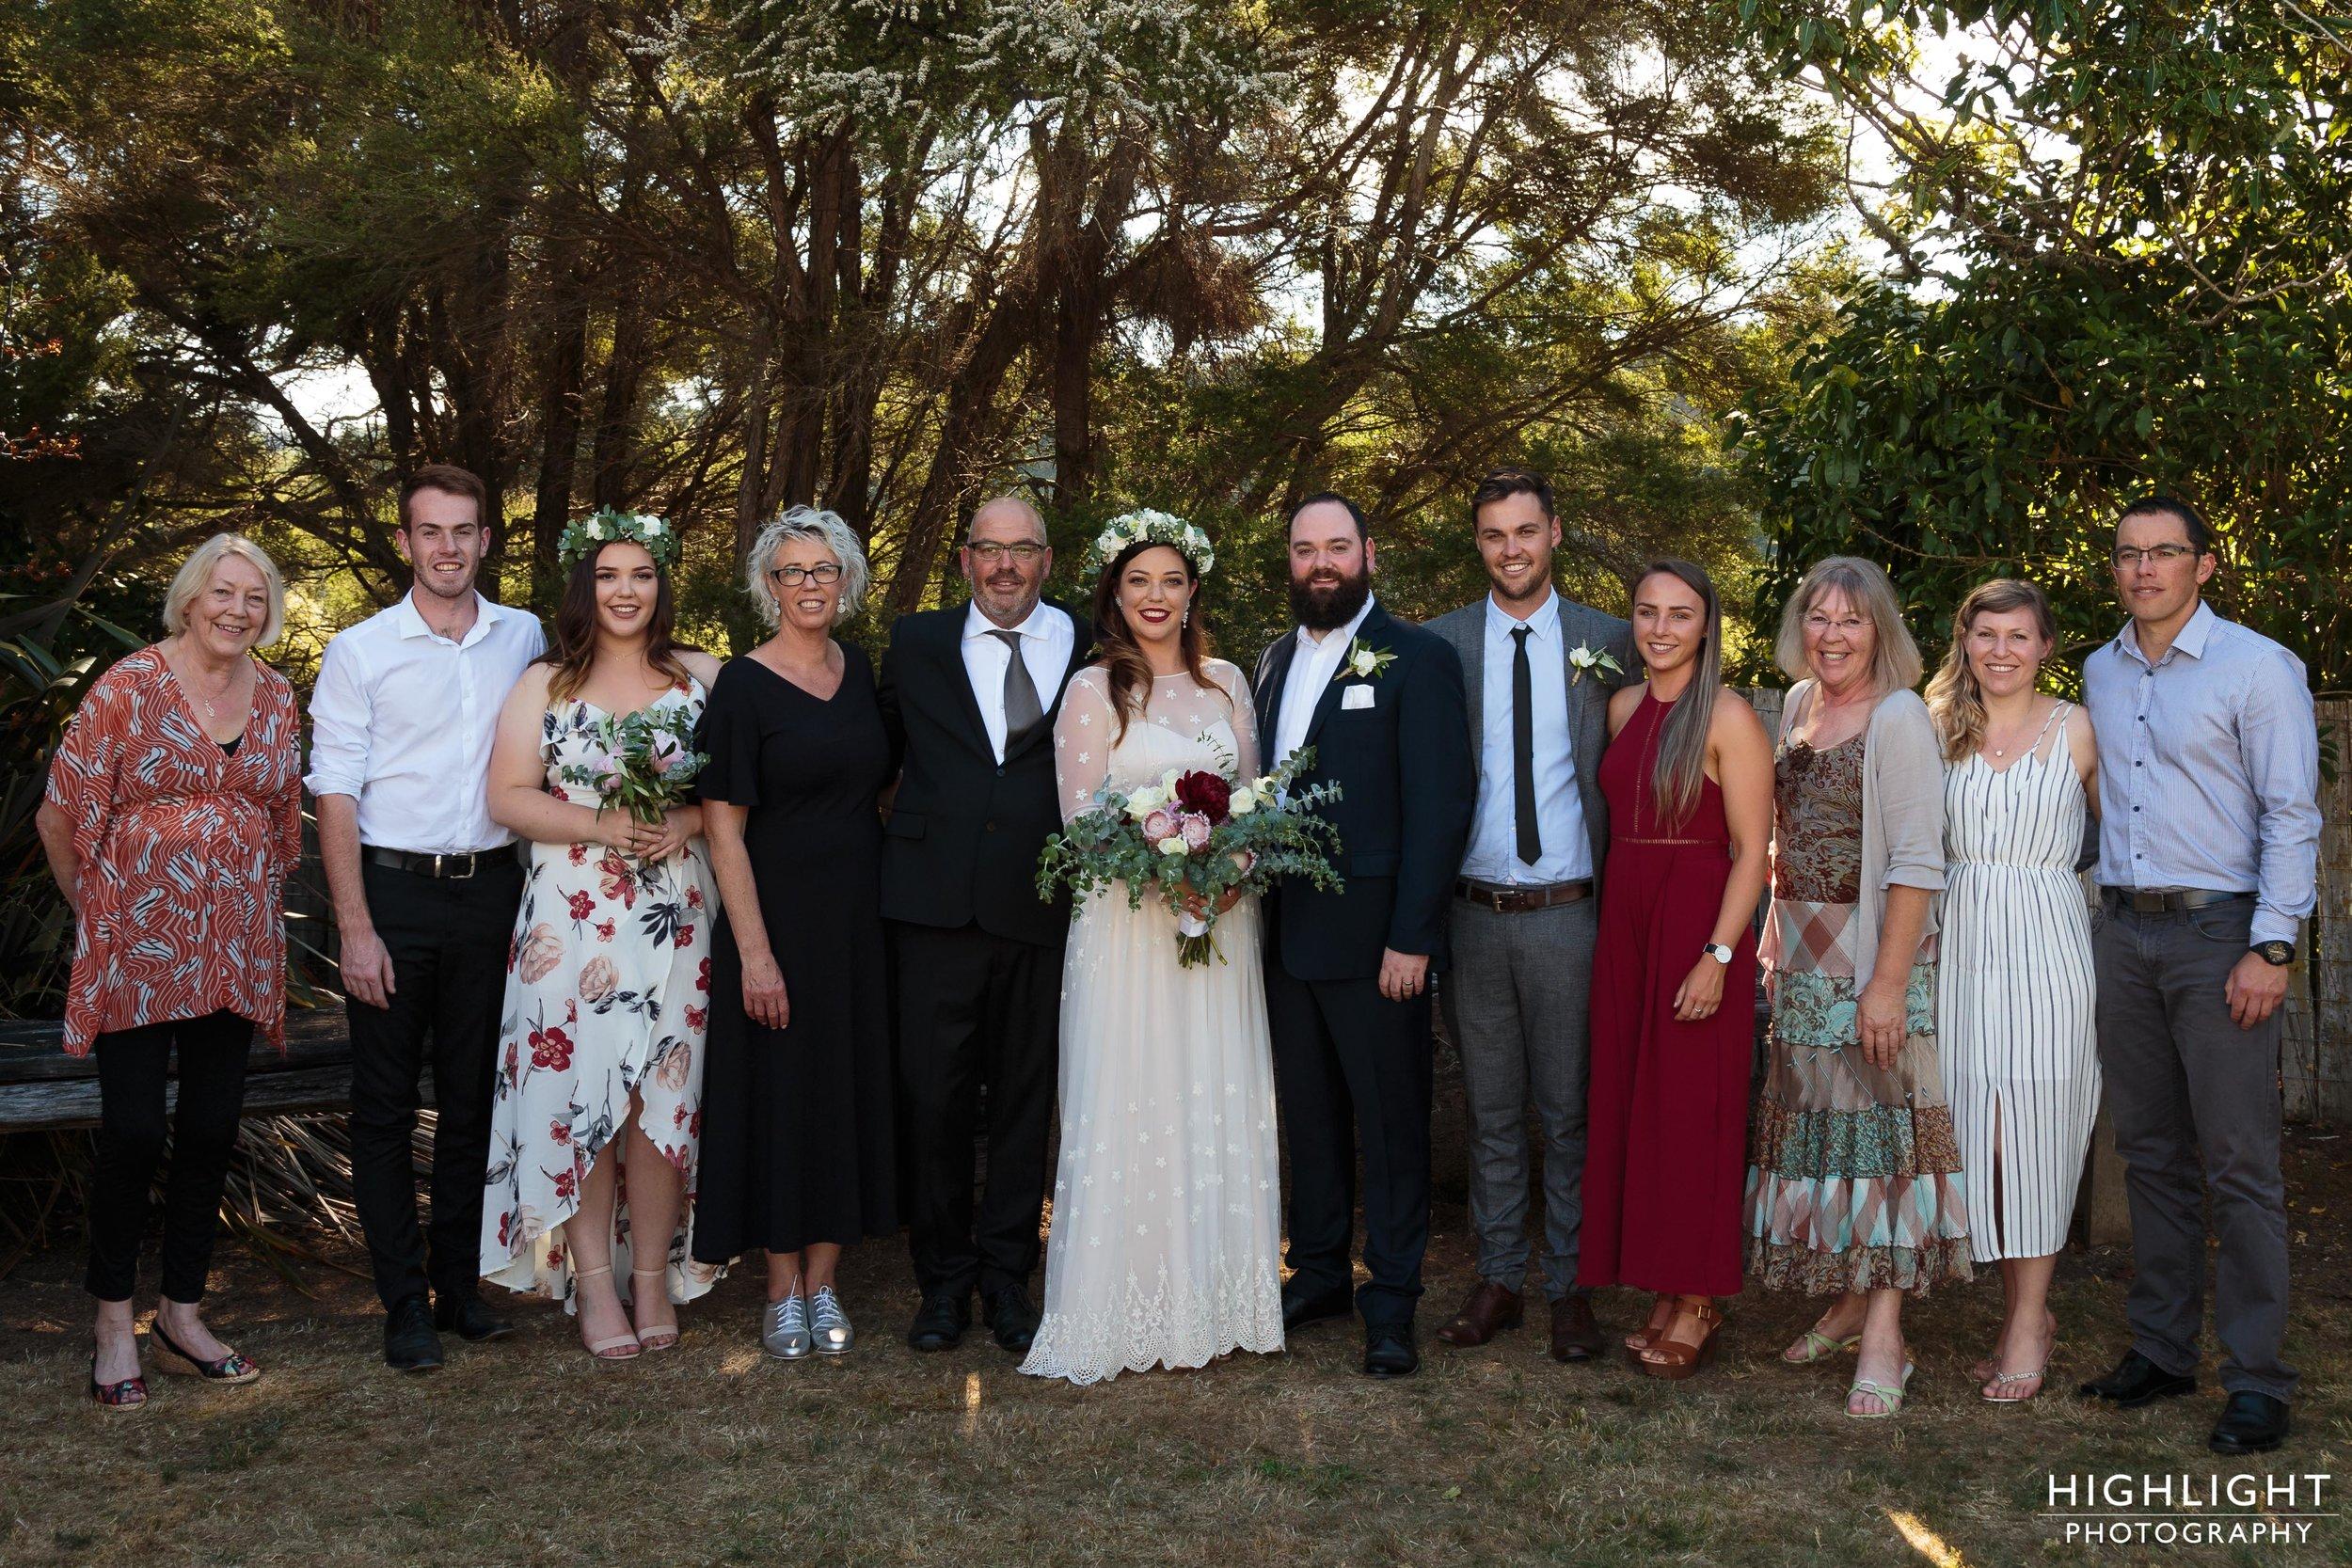 highlight-wedding-photography-new-zealand-makoura-lodge-wedding-111.jpg